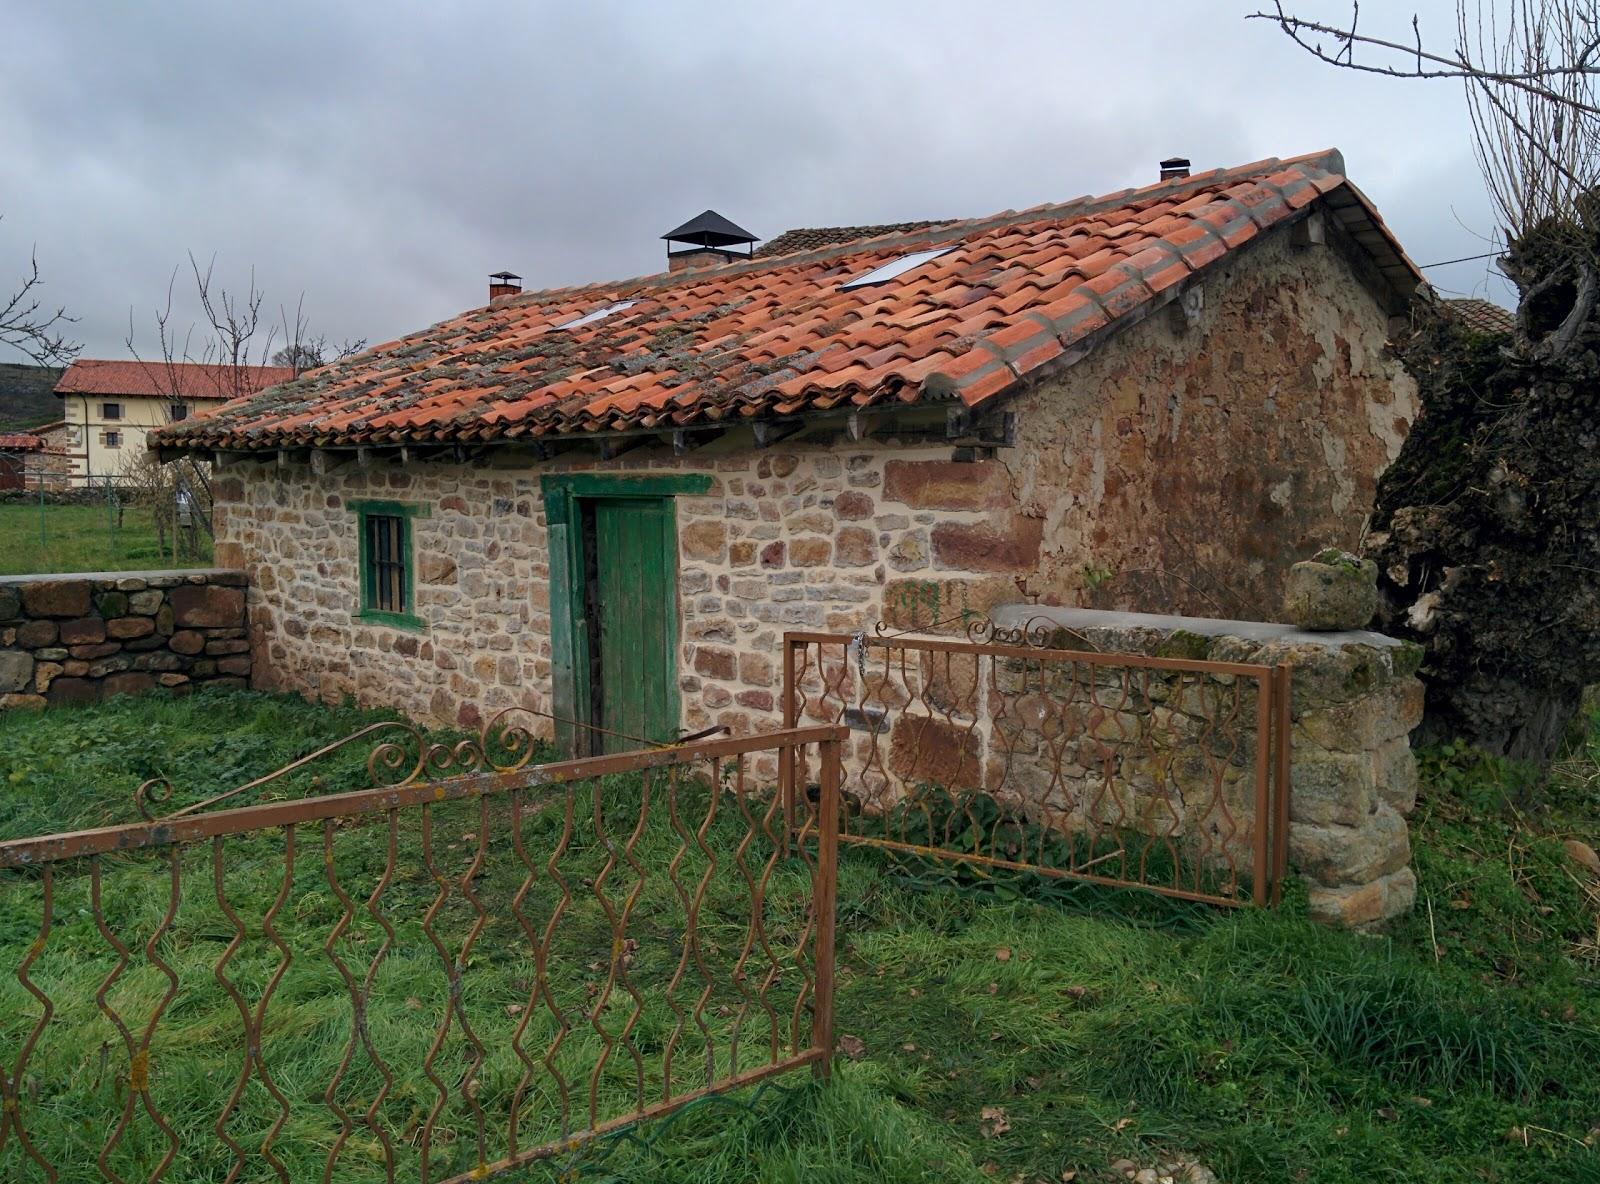 Barcenilla de Pisuerga